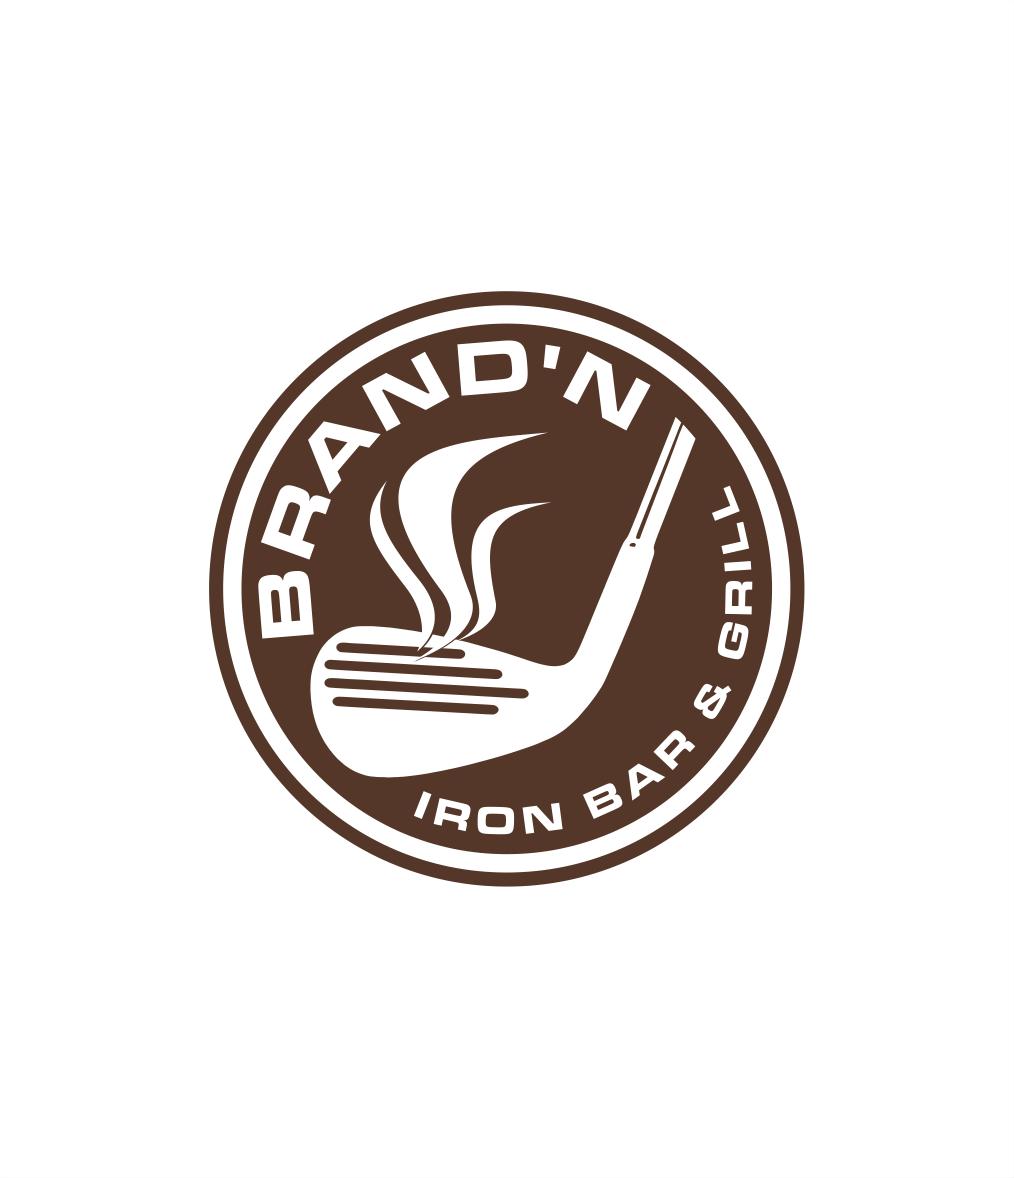 Logo Design by Raymond Garcia - Entry No. 227 in the Logo Design Contest Captivating Logo Design for Brand'n Iron Bar & Grill.